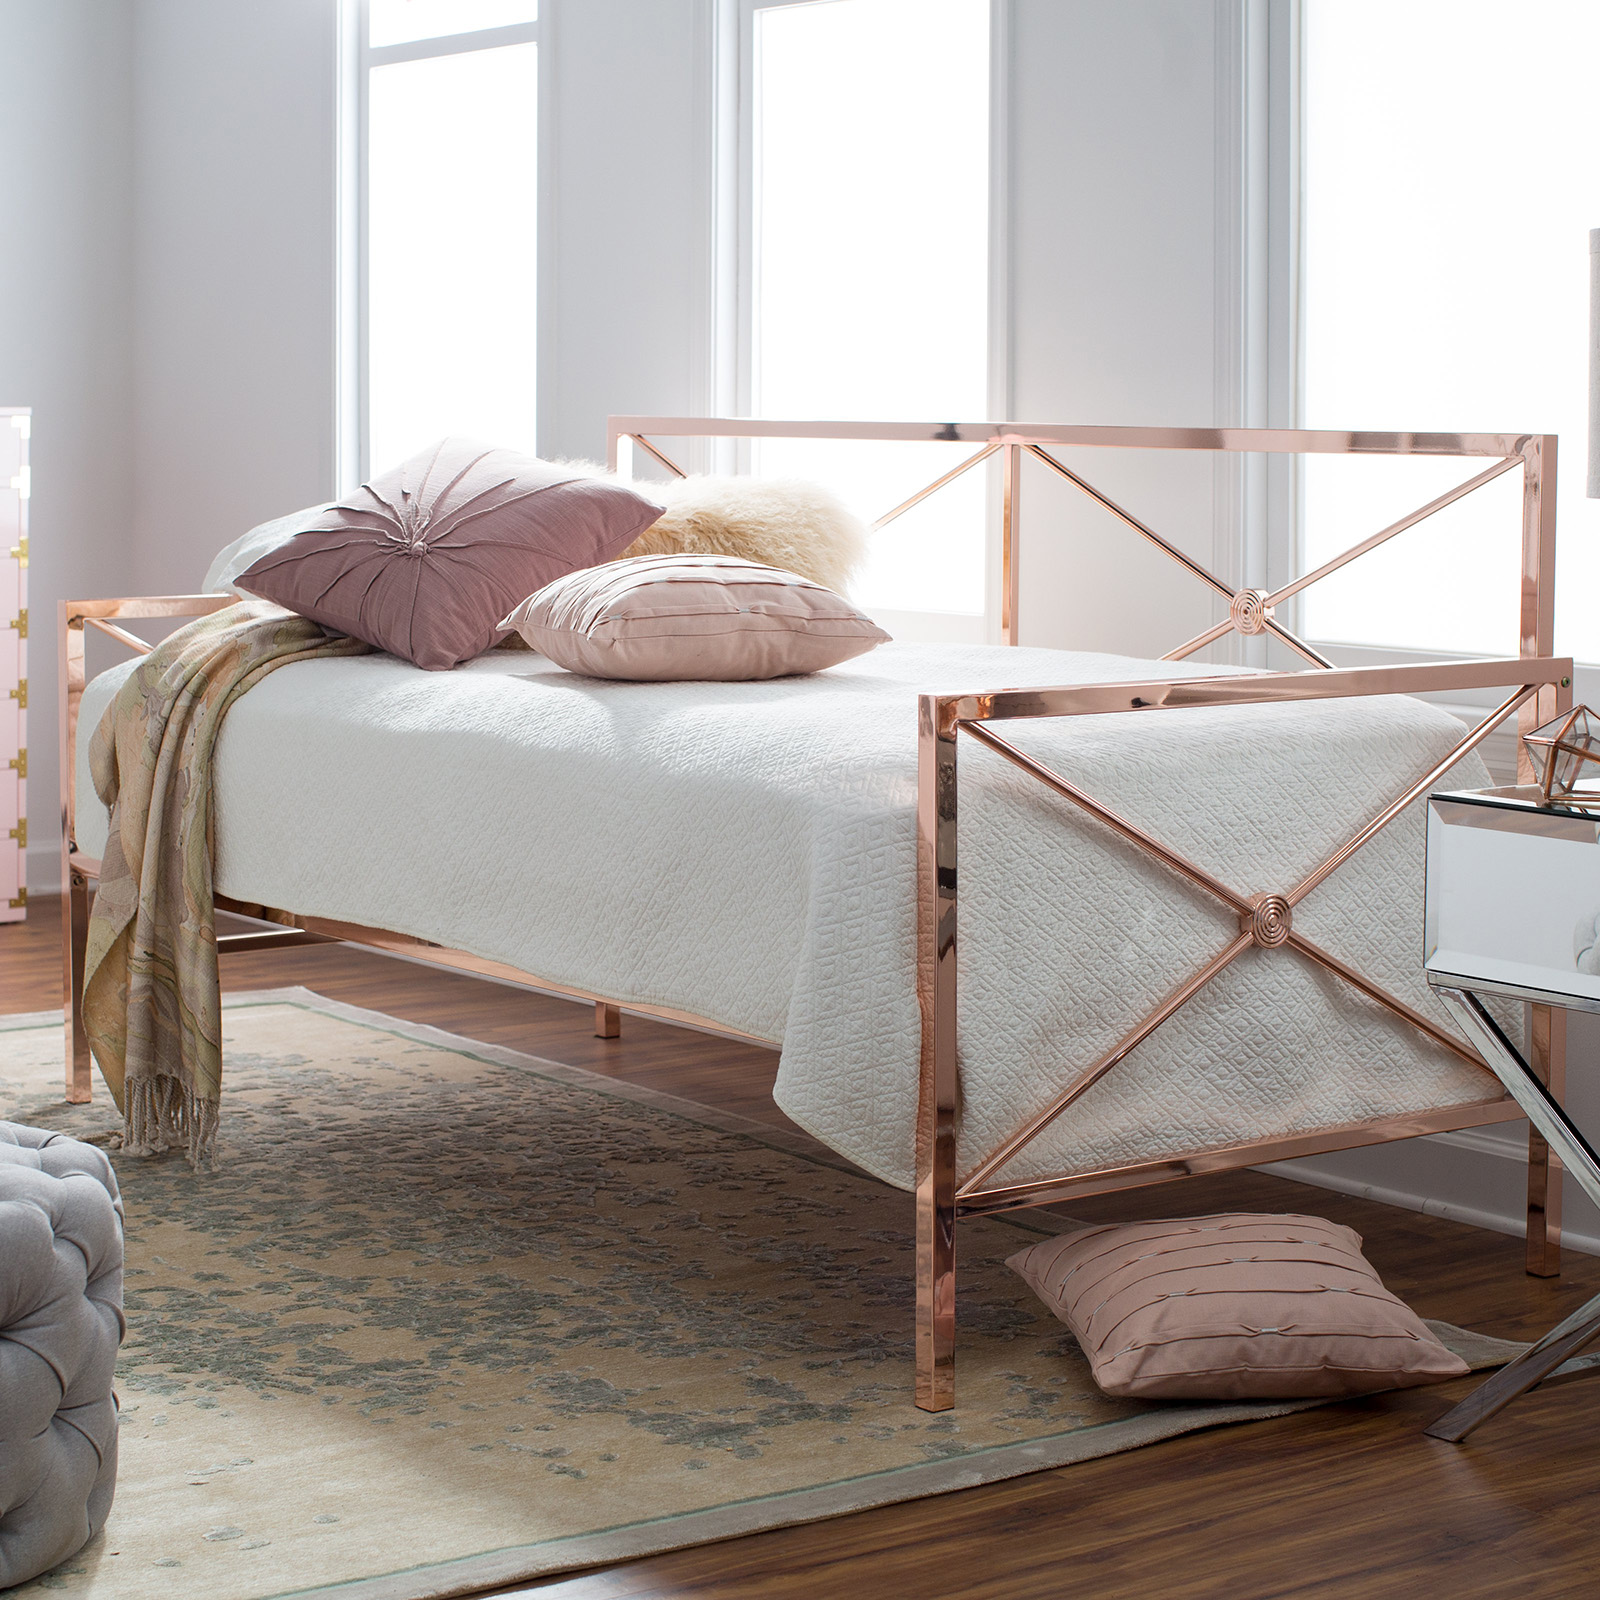 First Blush Chic Pink Furniture Decor